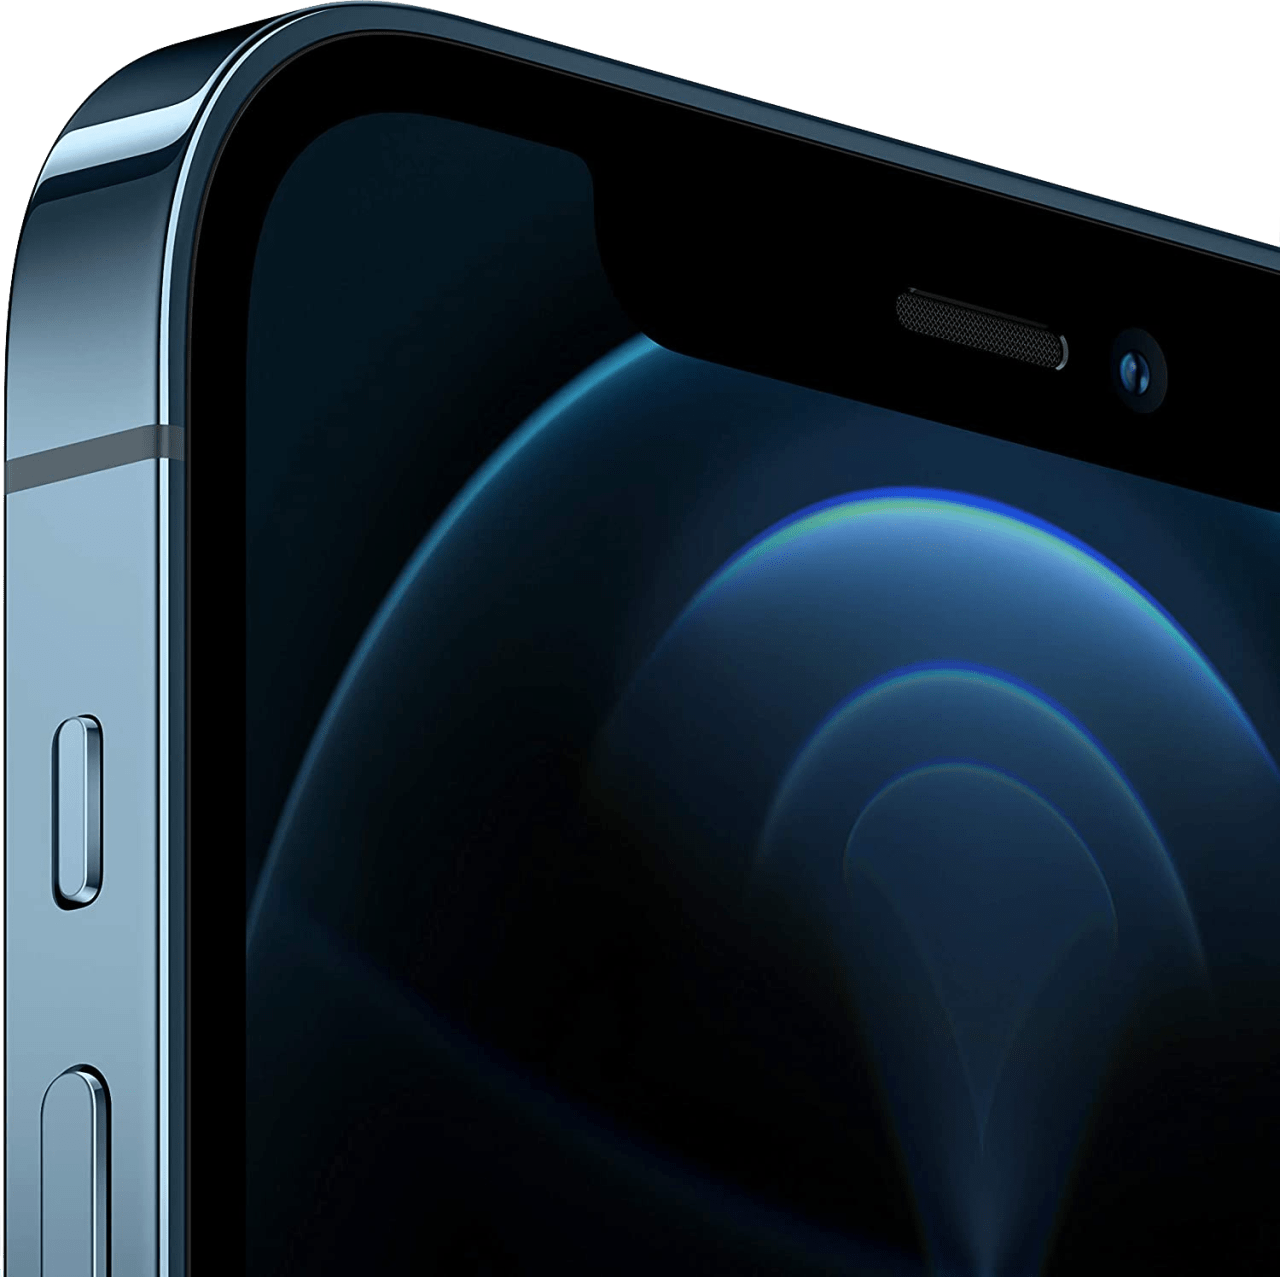 Blau Apple iPhone 12 Pro 128GB.4